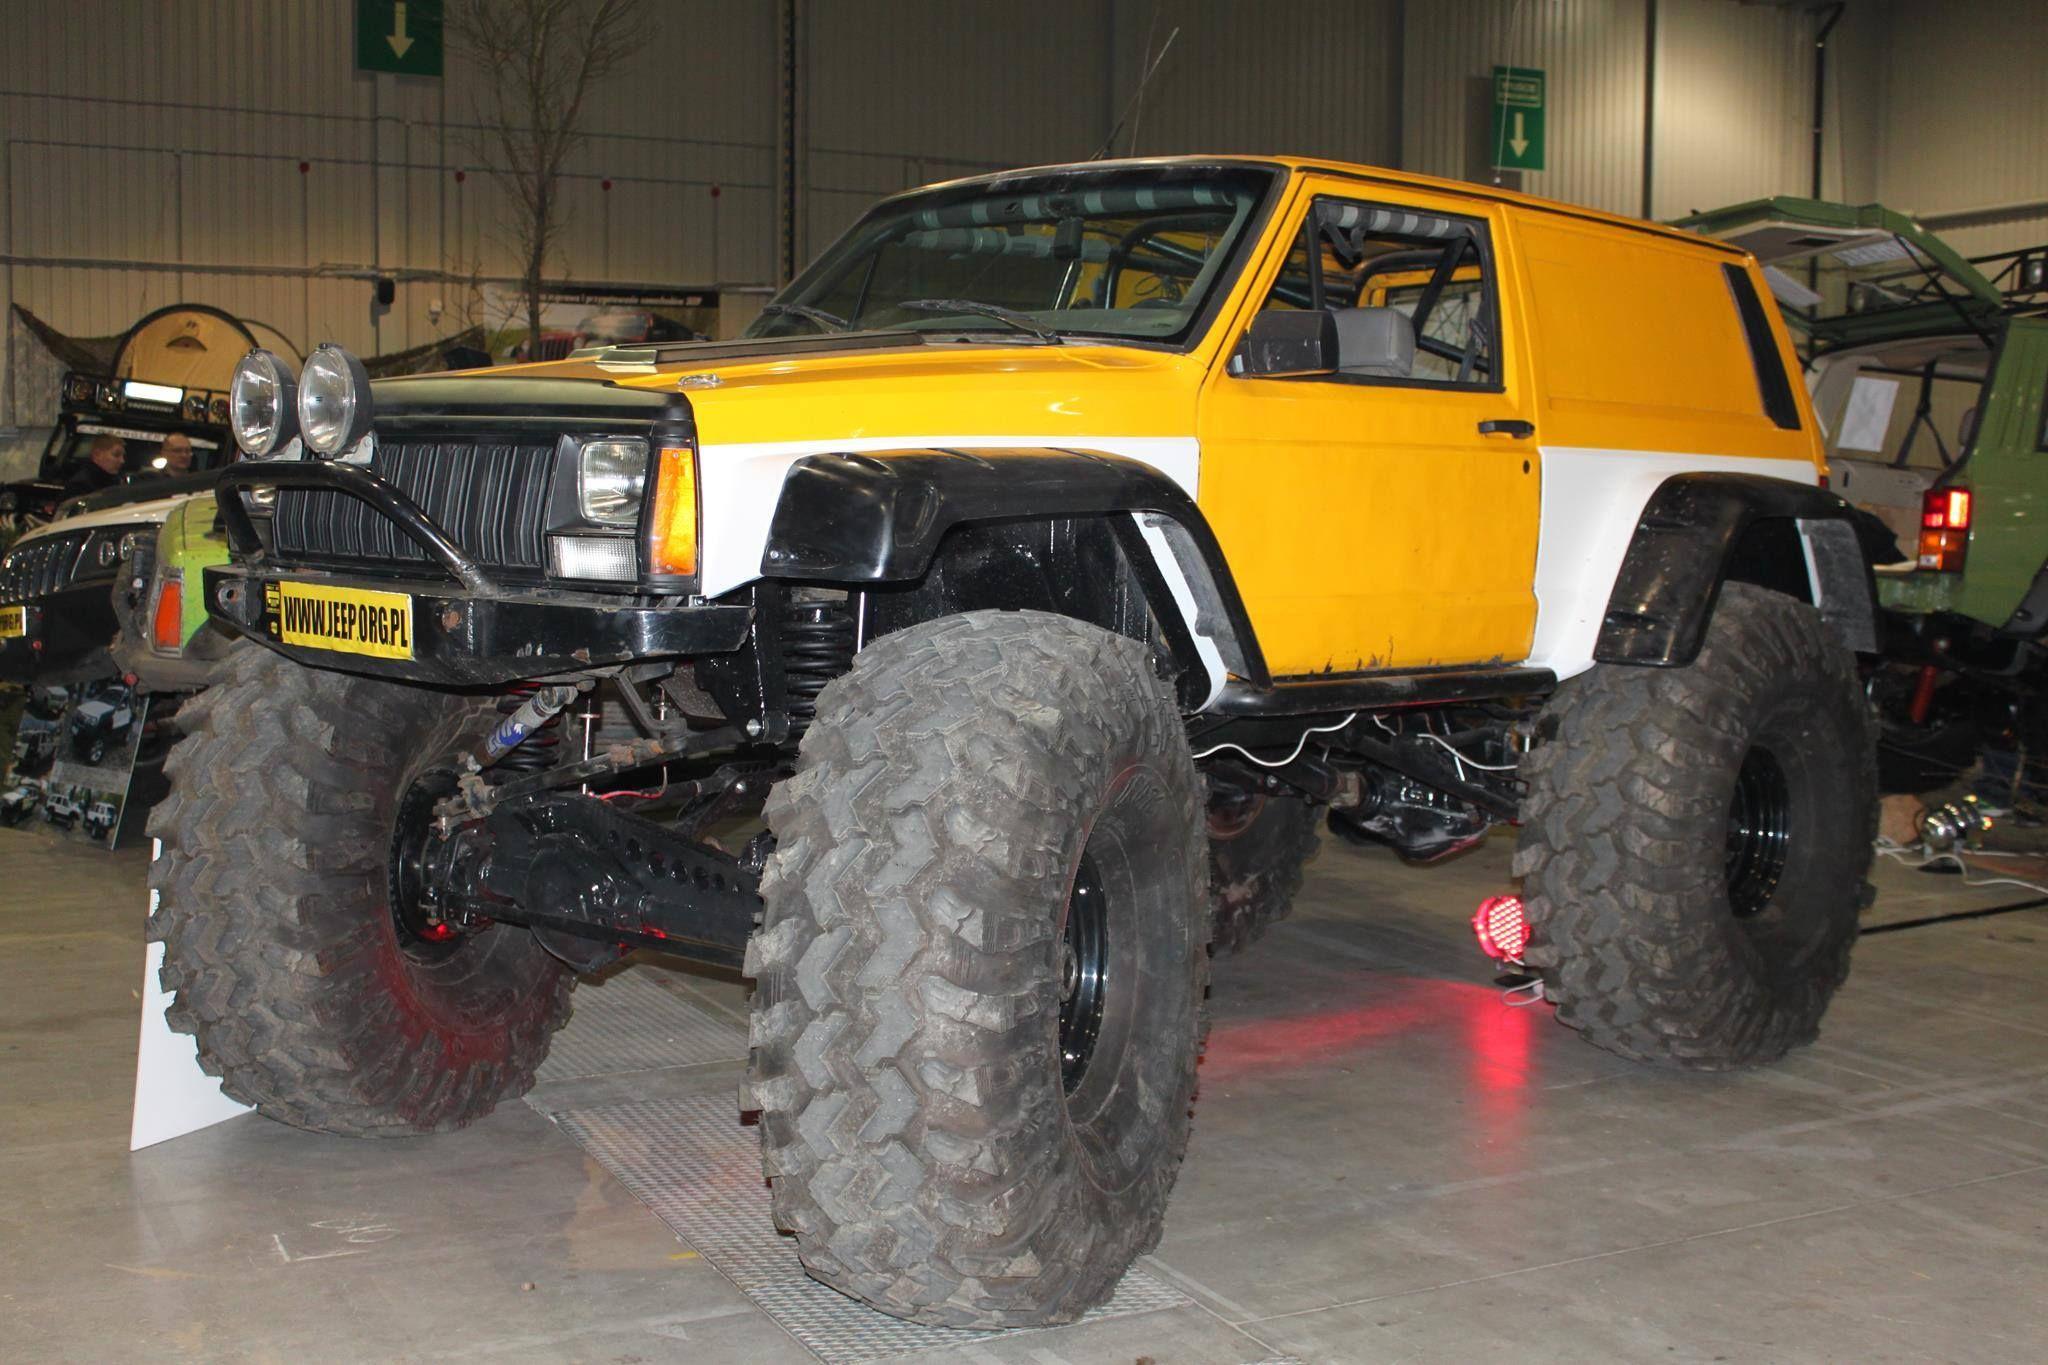 Jeep Cherokee Xj Jeep Cherokee Xj Jeep Xj Jeep Cherokee